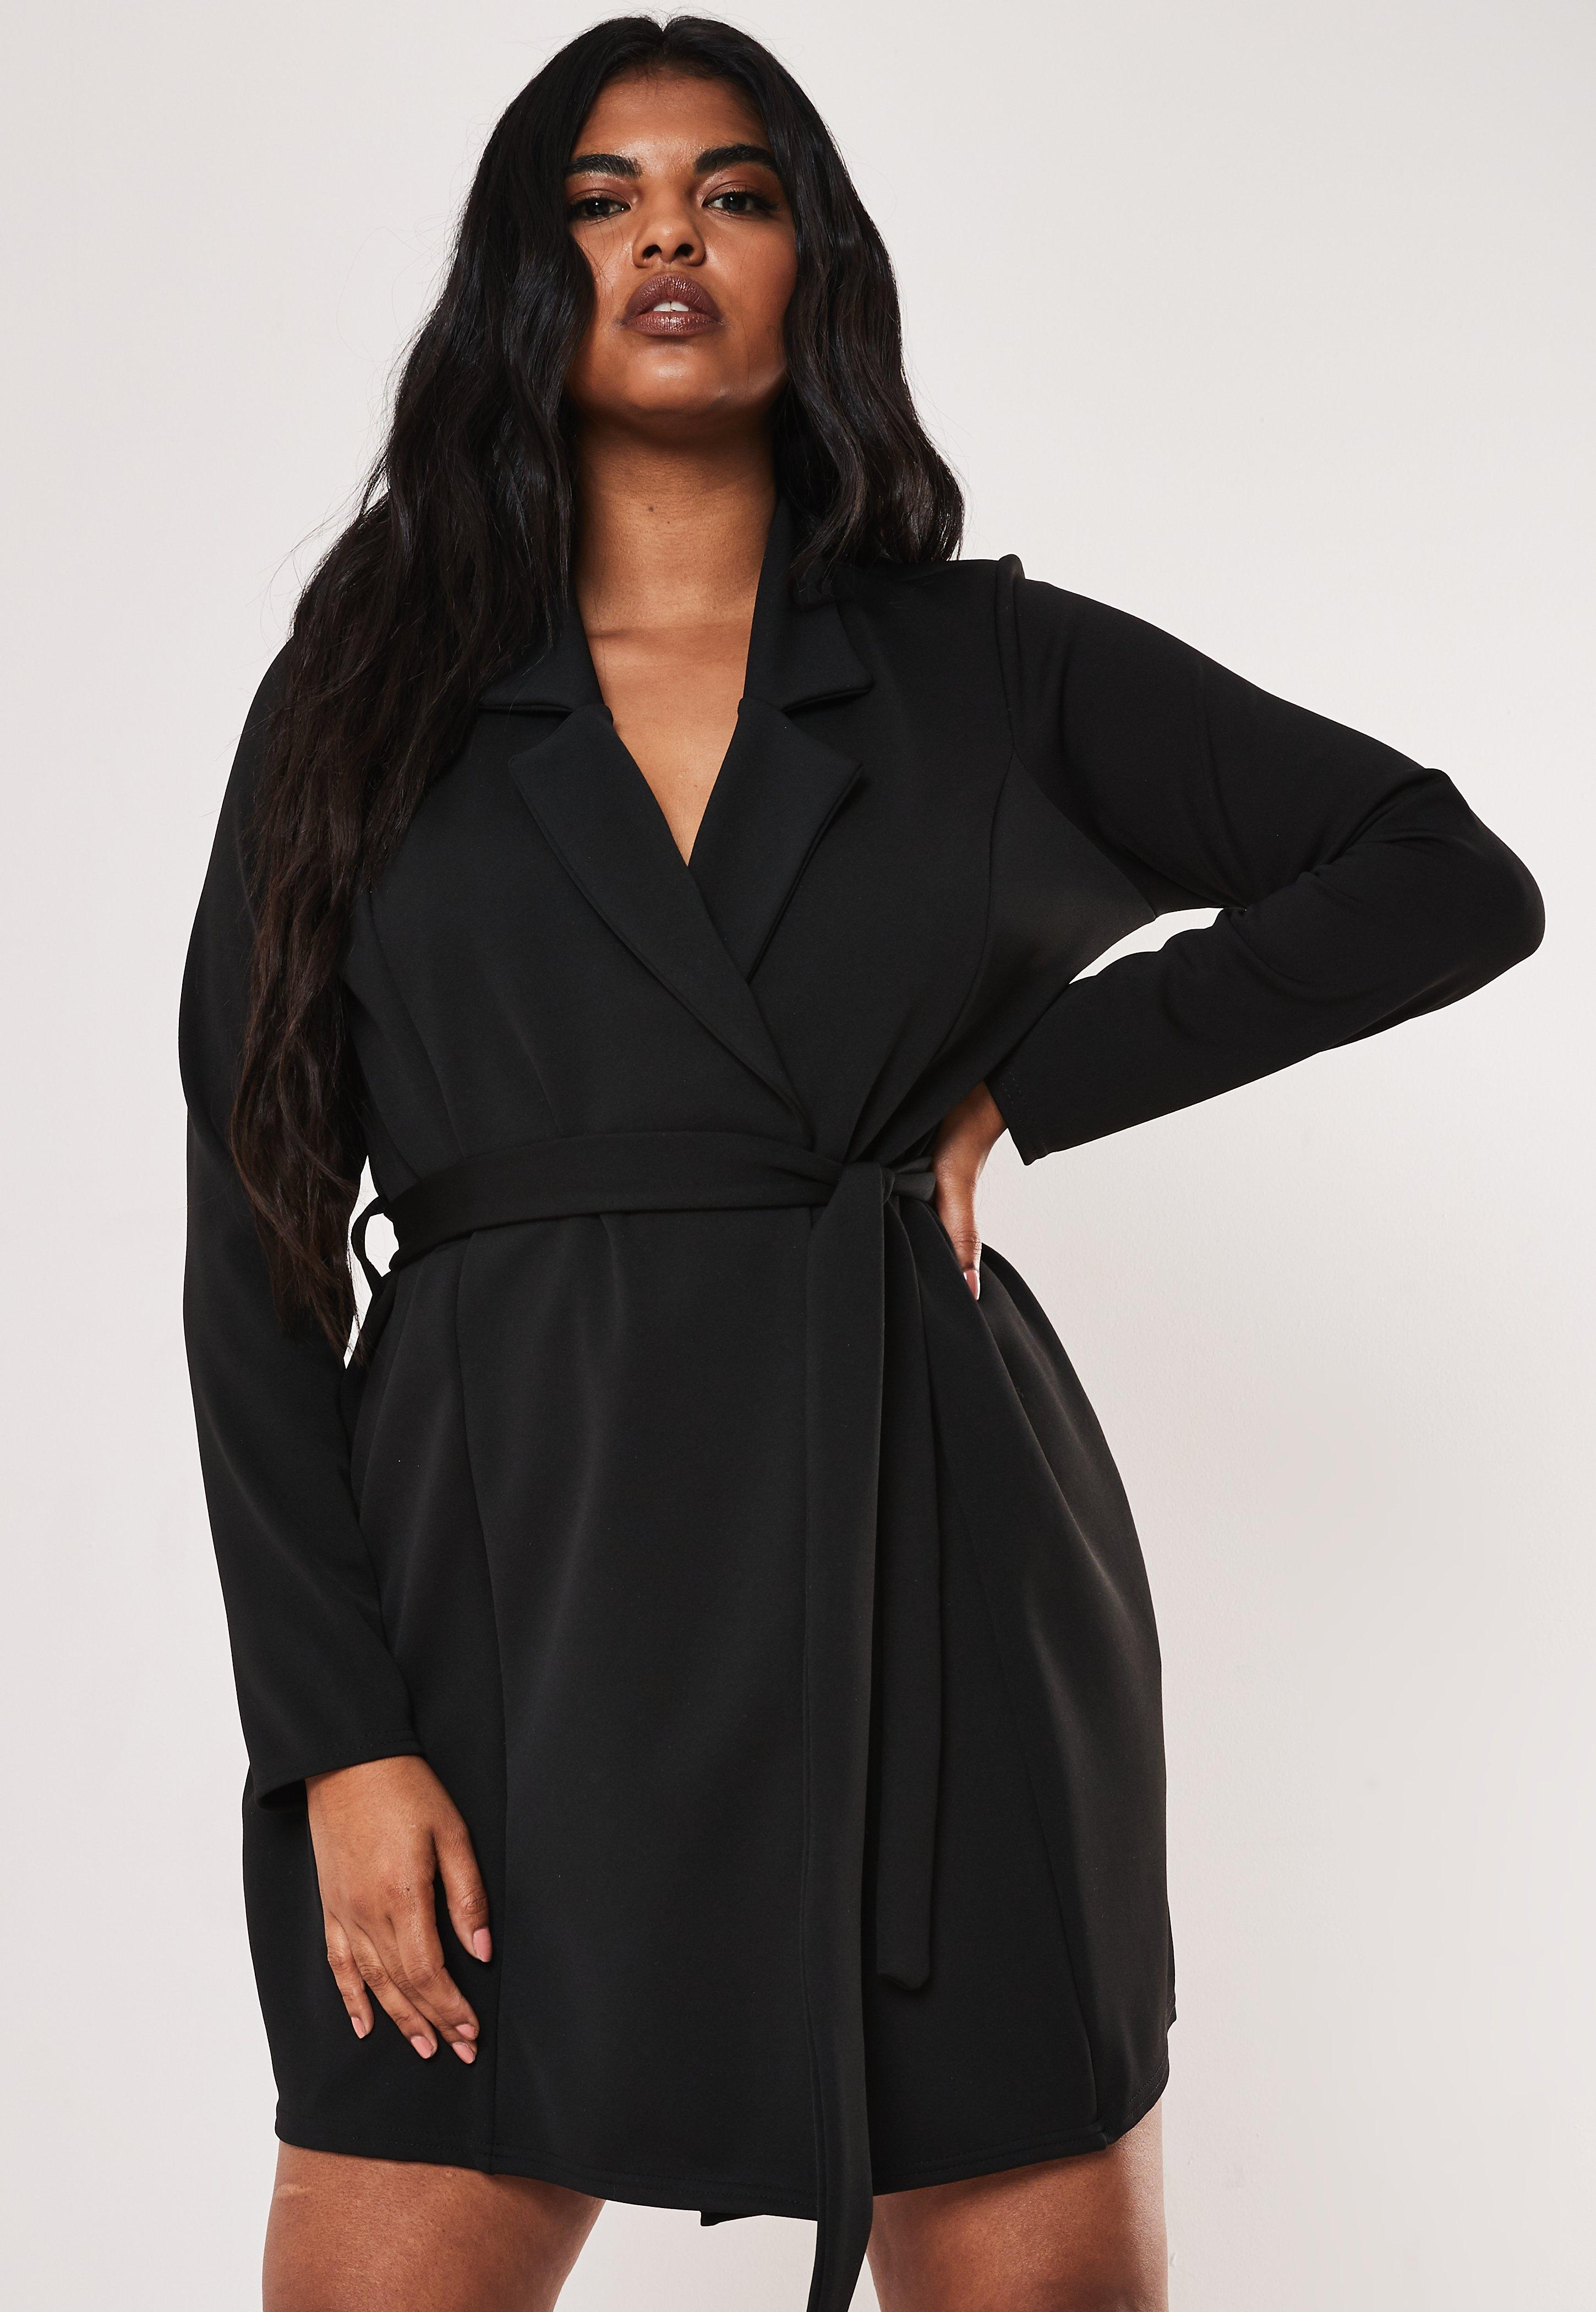 83524b6d54a Blazer Dresses | Shop Tuxedo Dresses - Missguided